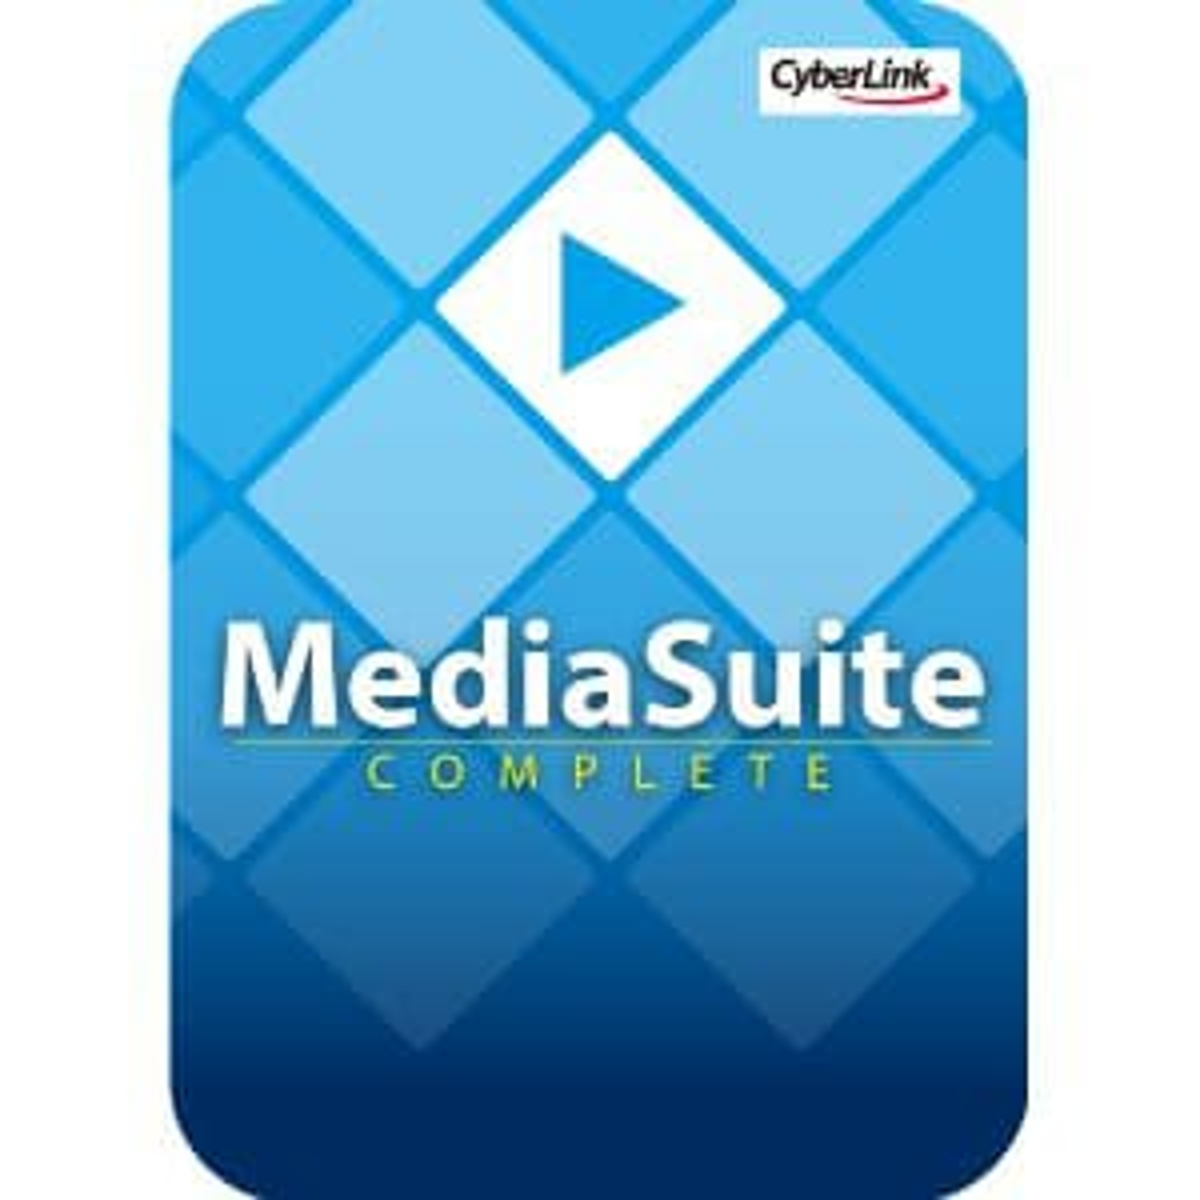 Media Suite COMPLETE